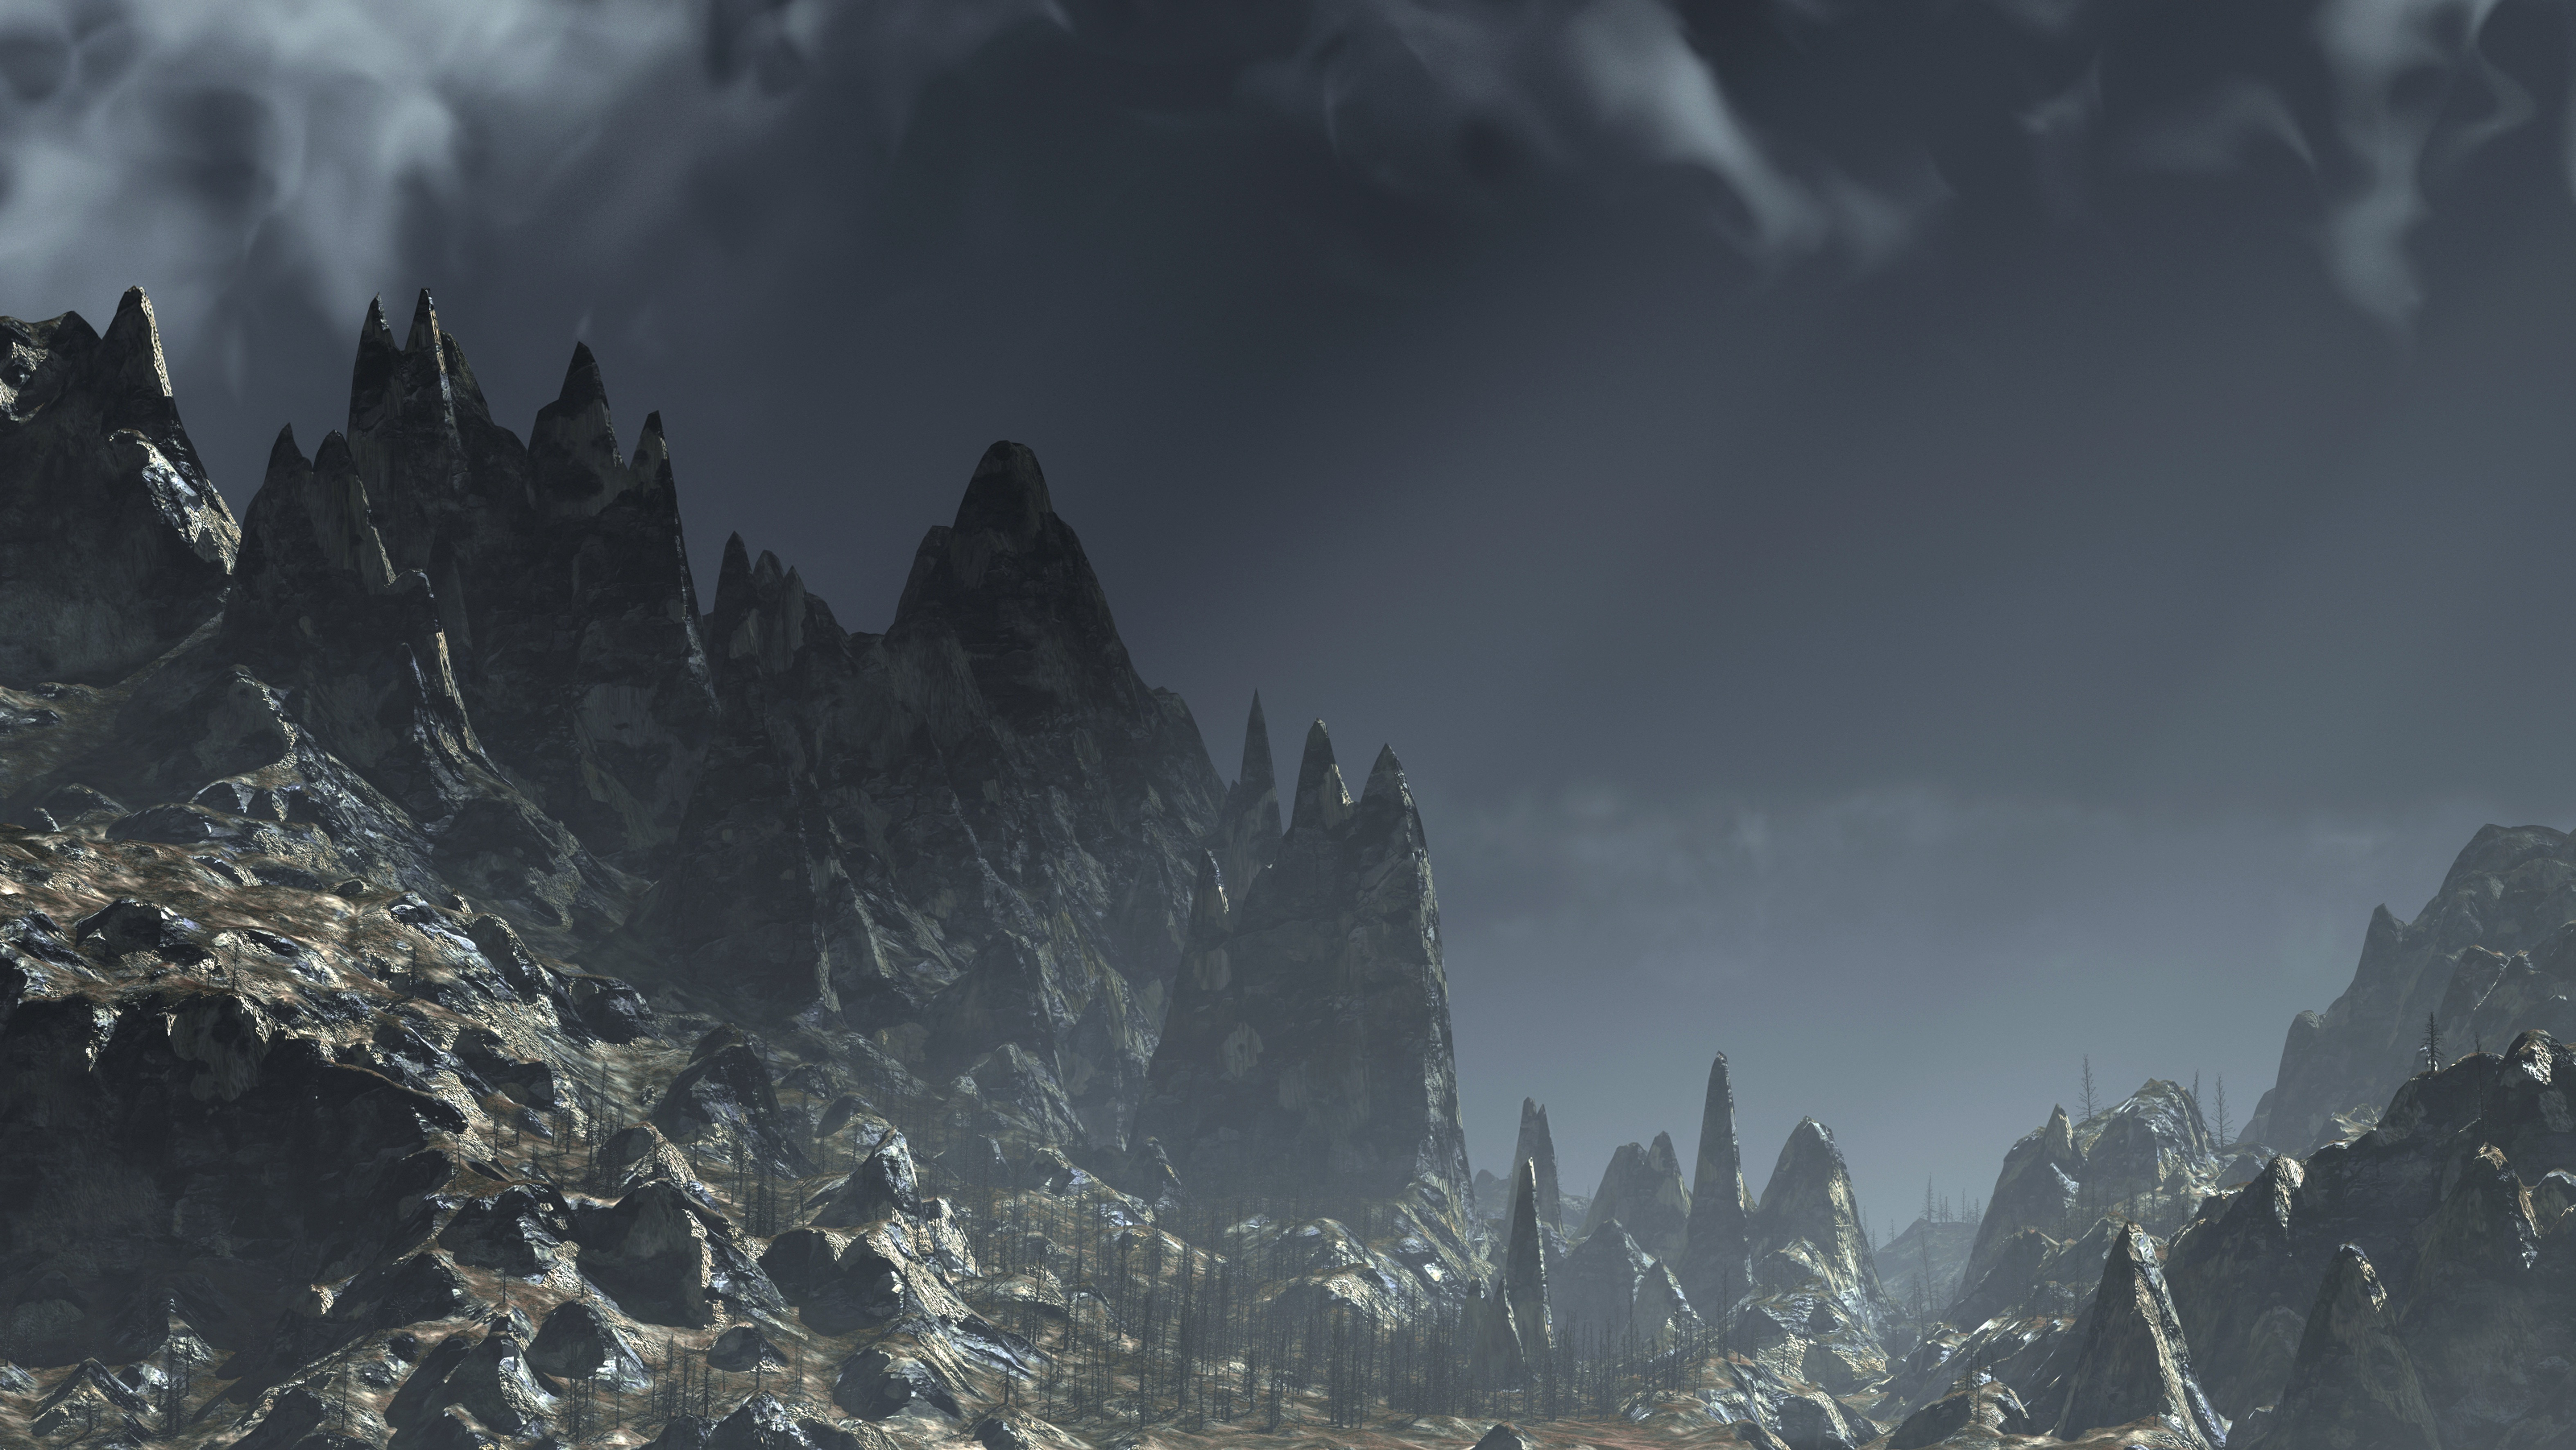 a barren mountain landscape CGI